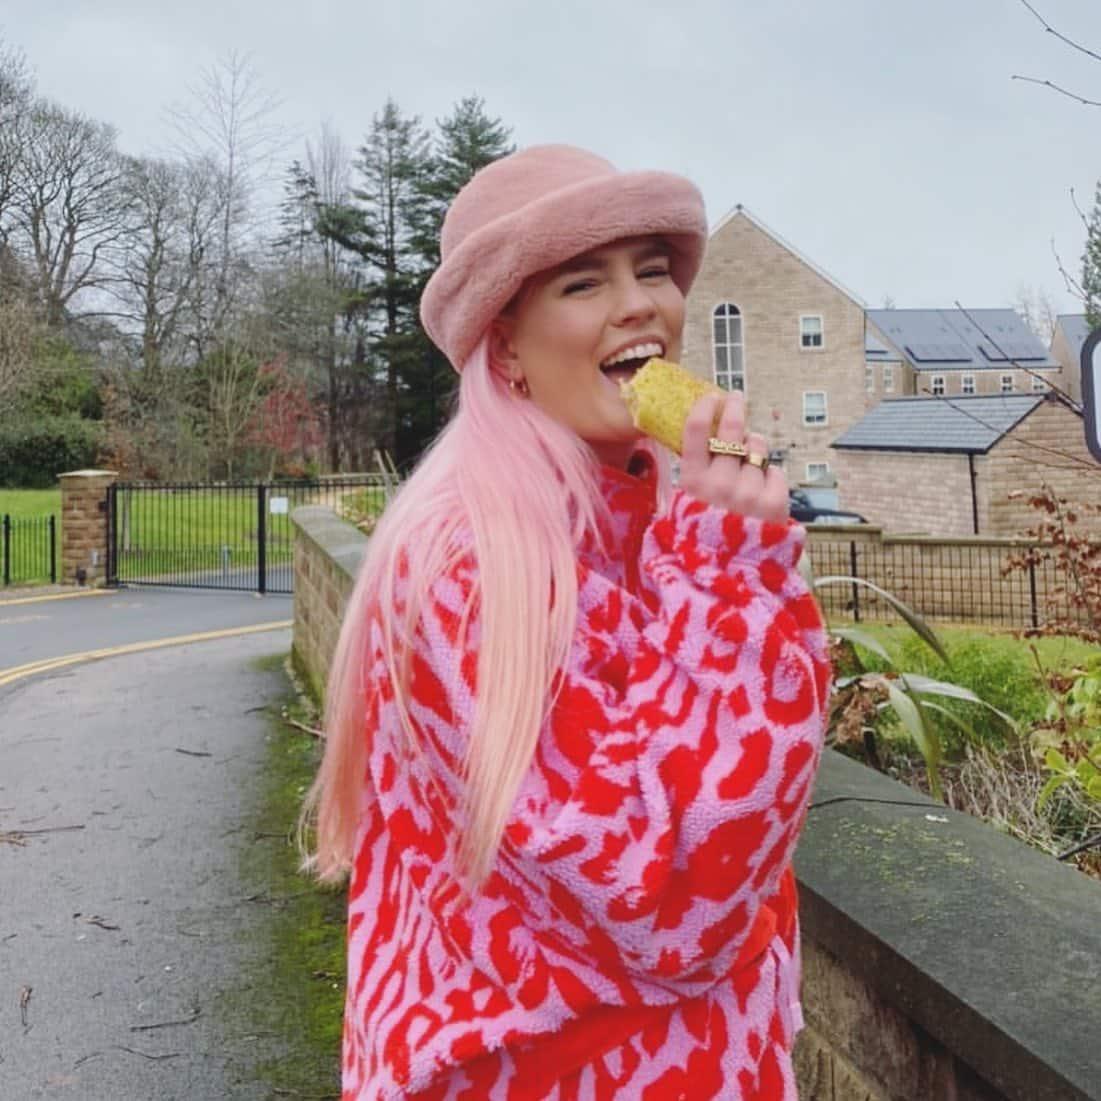 Girl in pink jacket eating